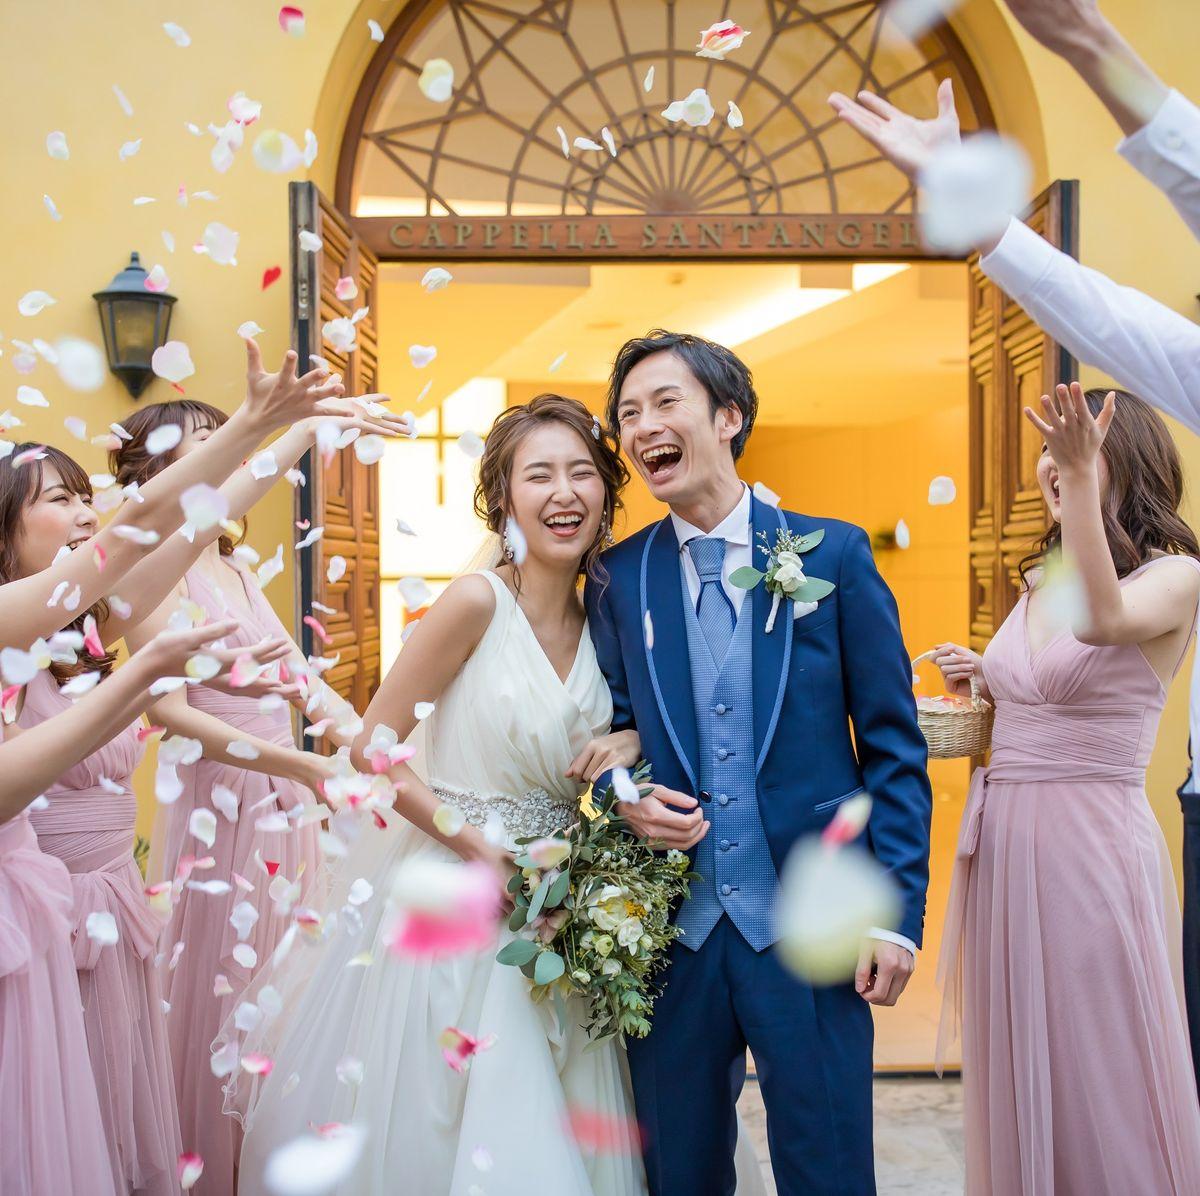 CITTA' WEDDING  (LA CITTADELLA内)の公式写真1枚目